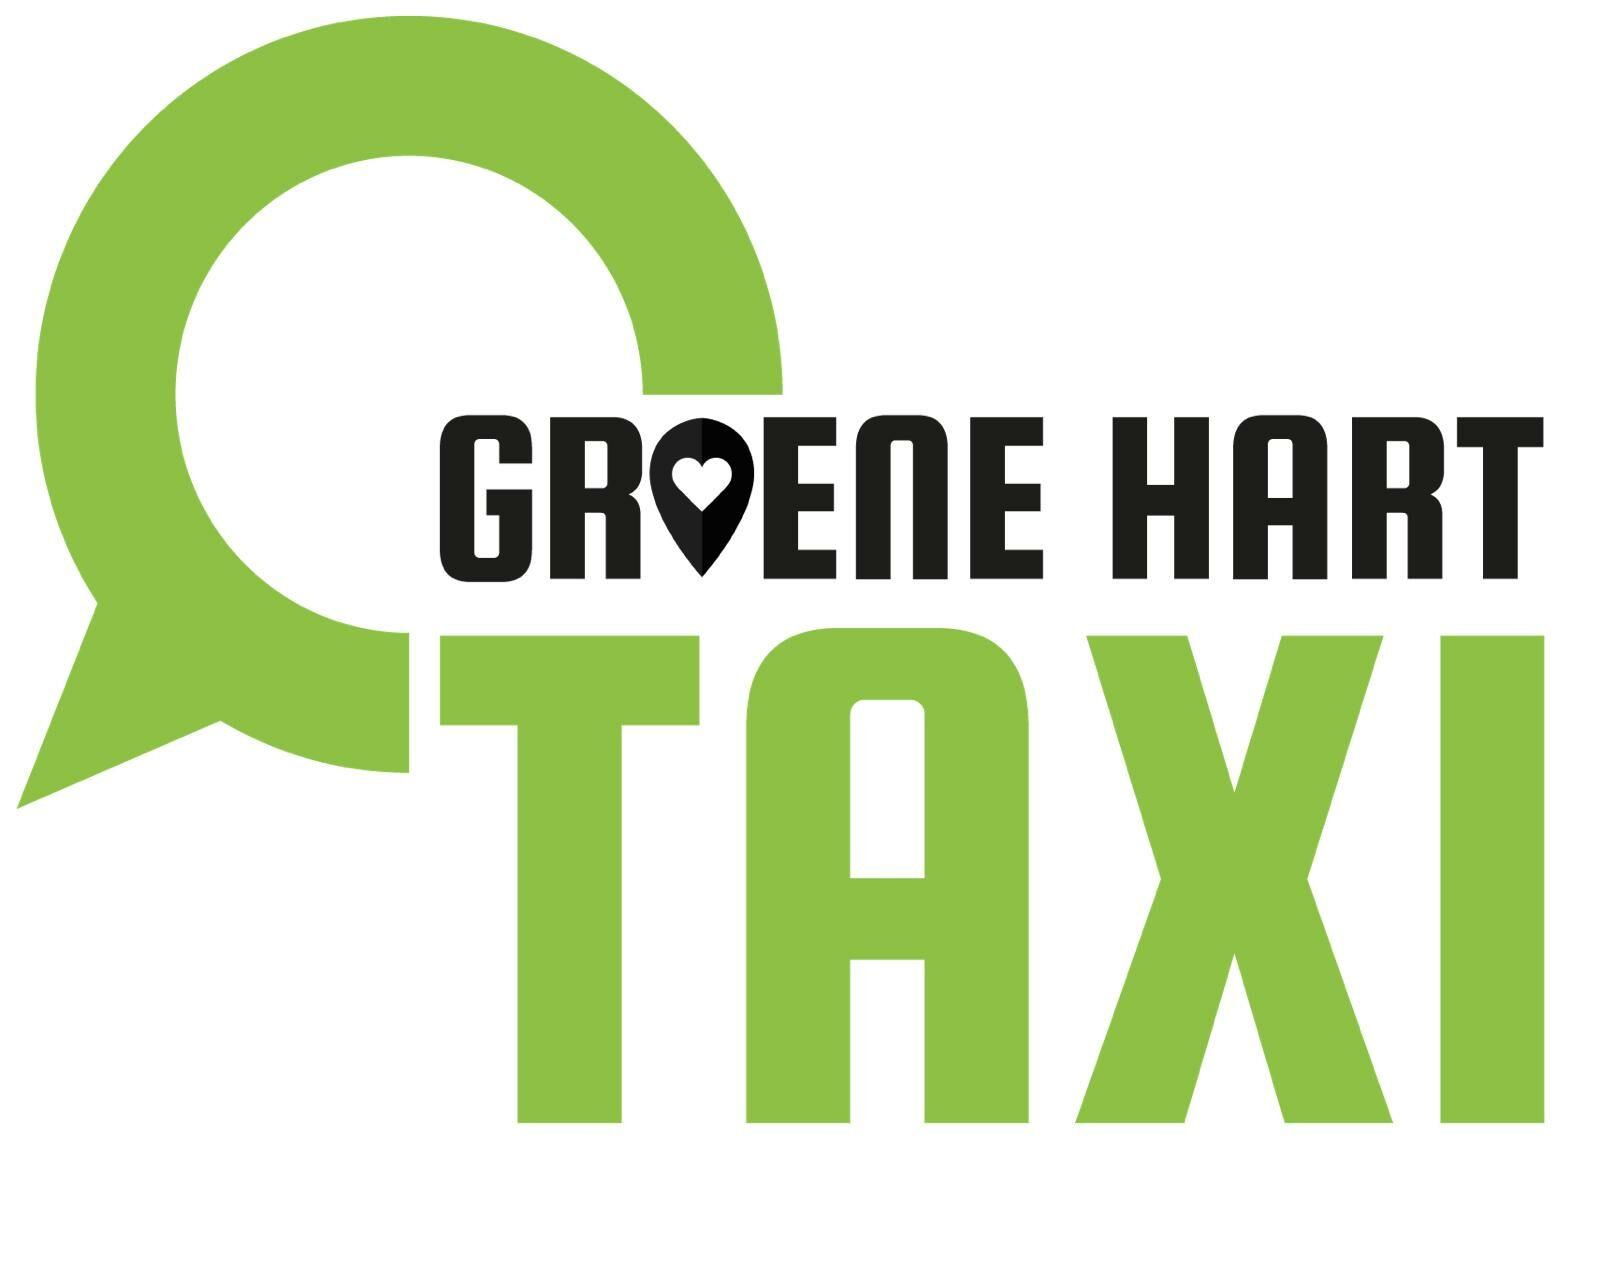 Groene Hart Taxi